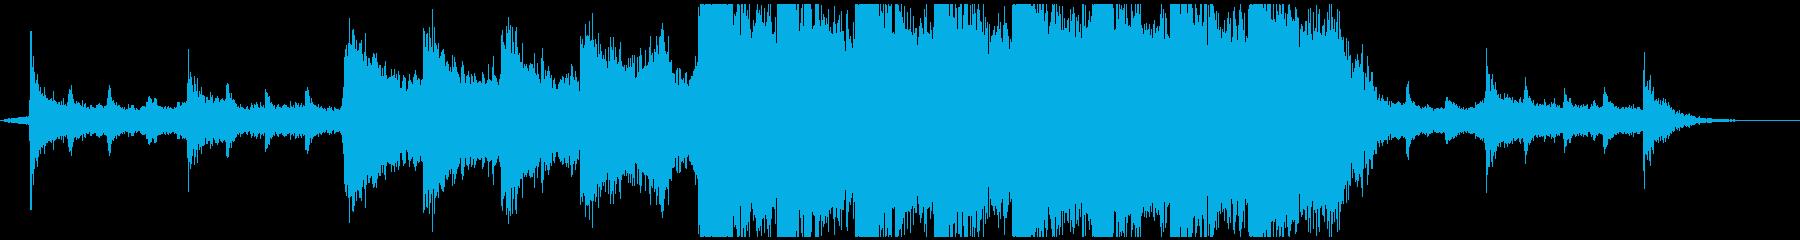 Horizon IIIの再生済みの波形